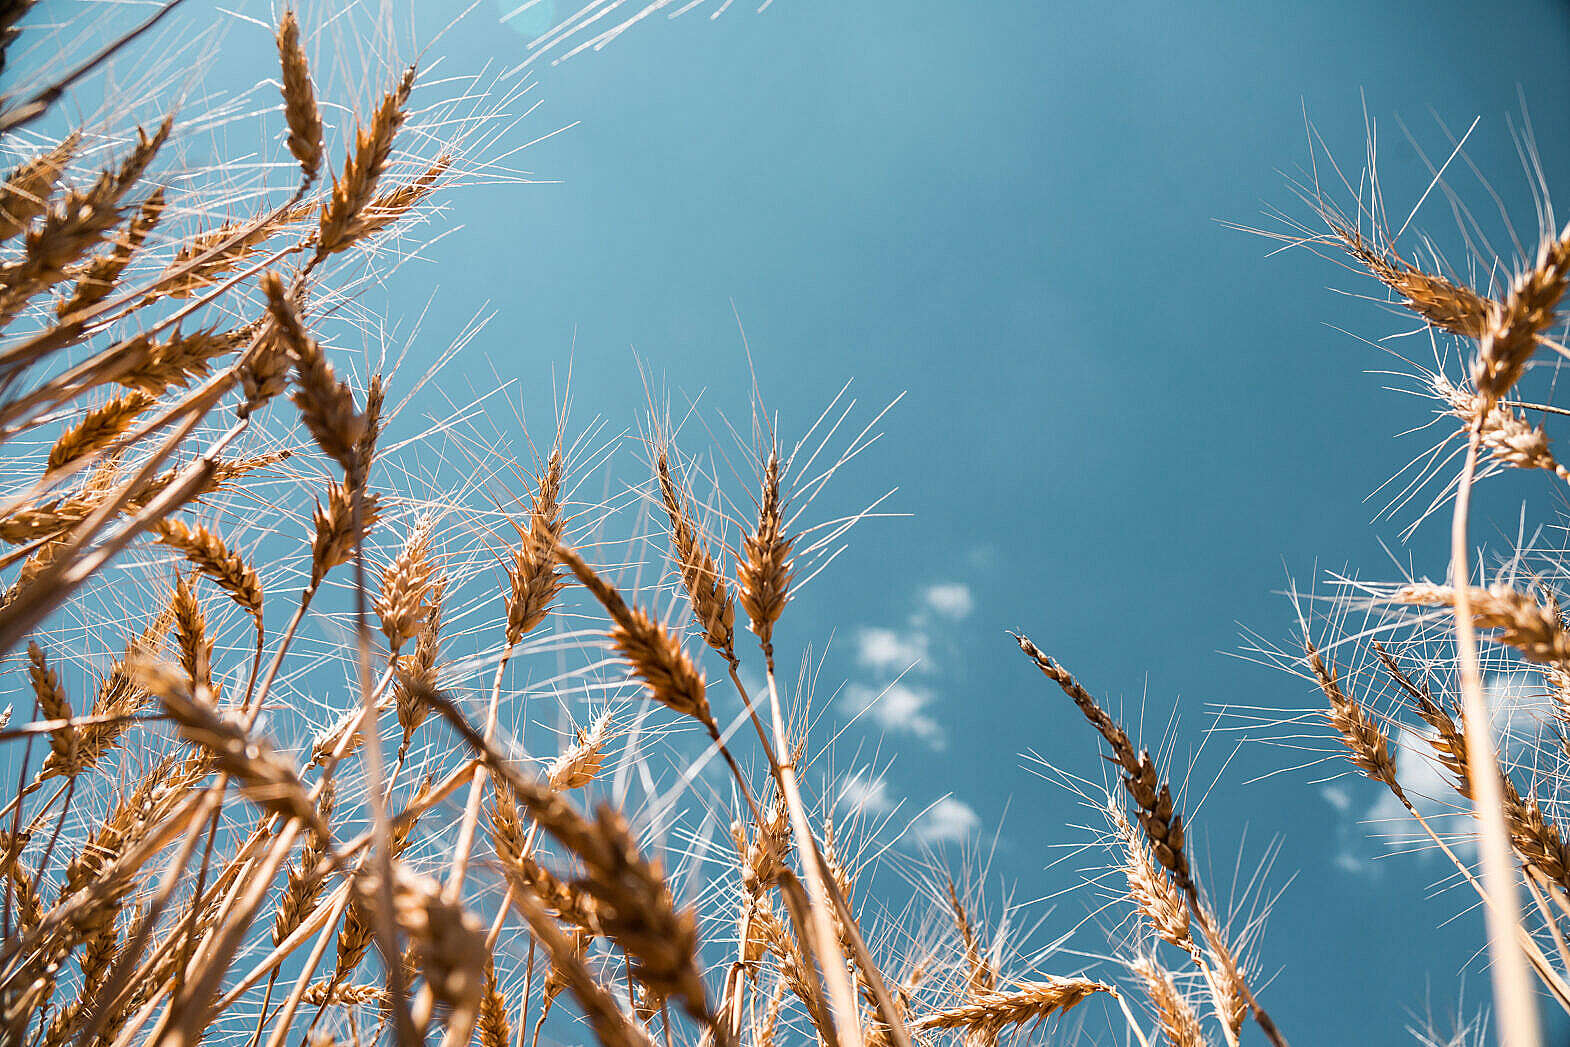 Wheat Field Free Stock Photo Download